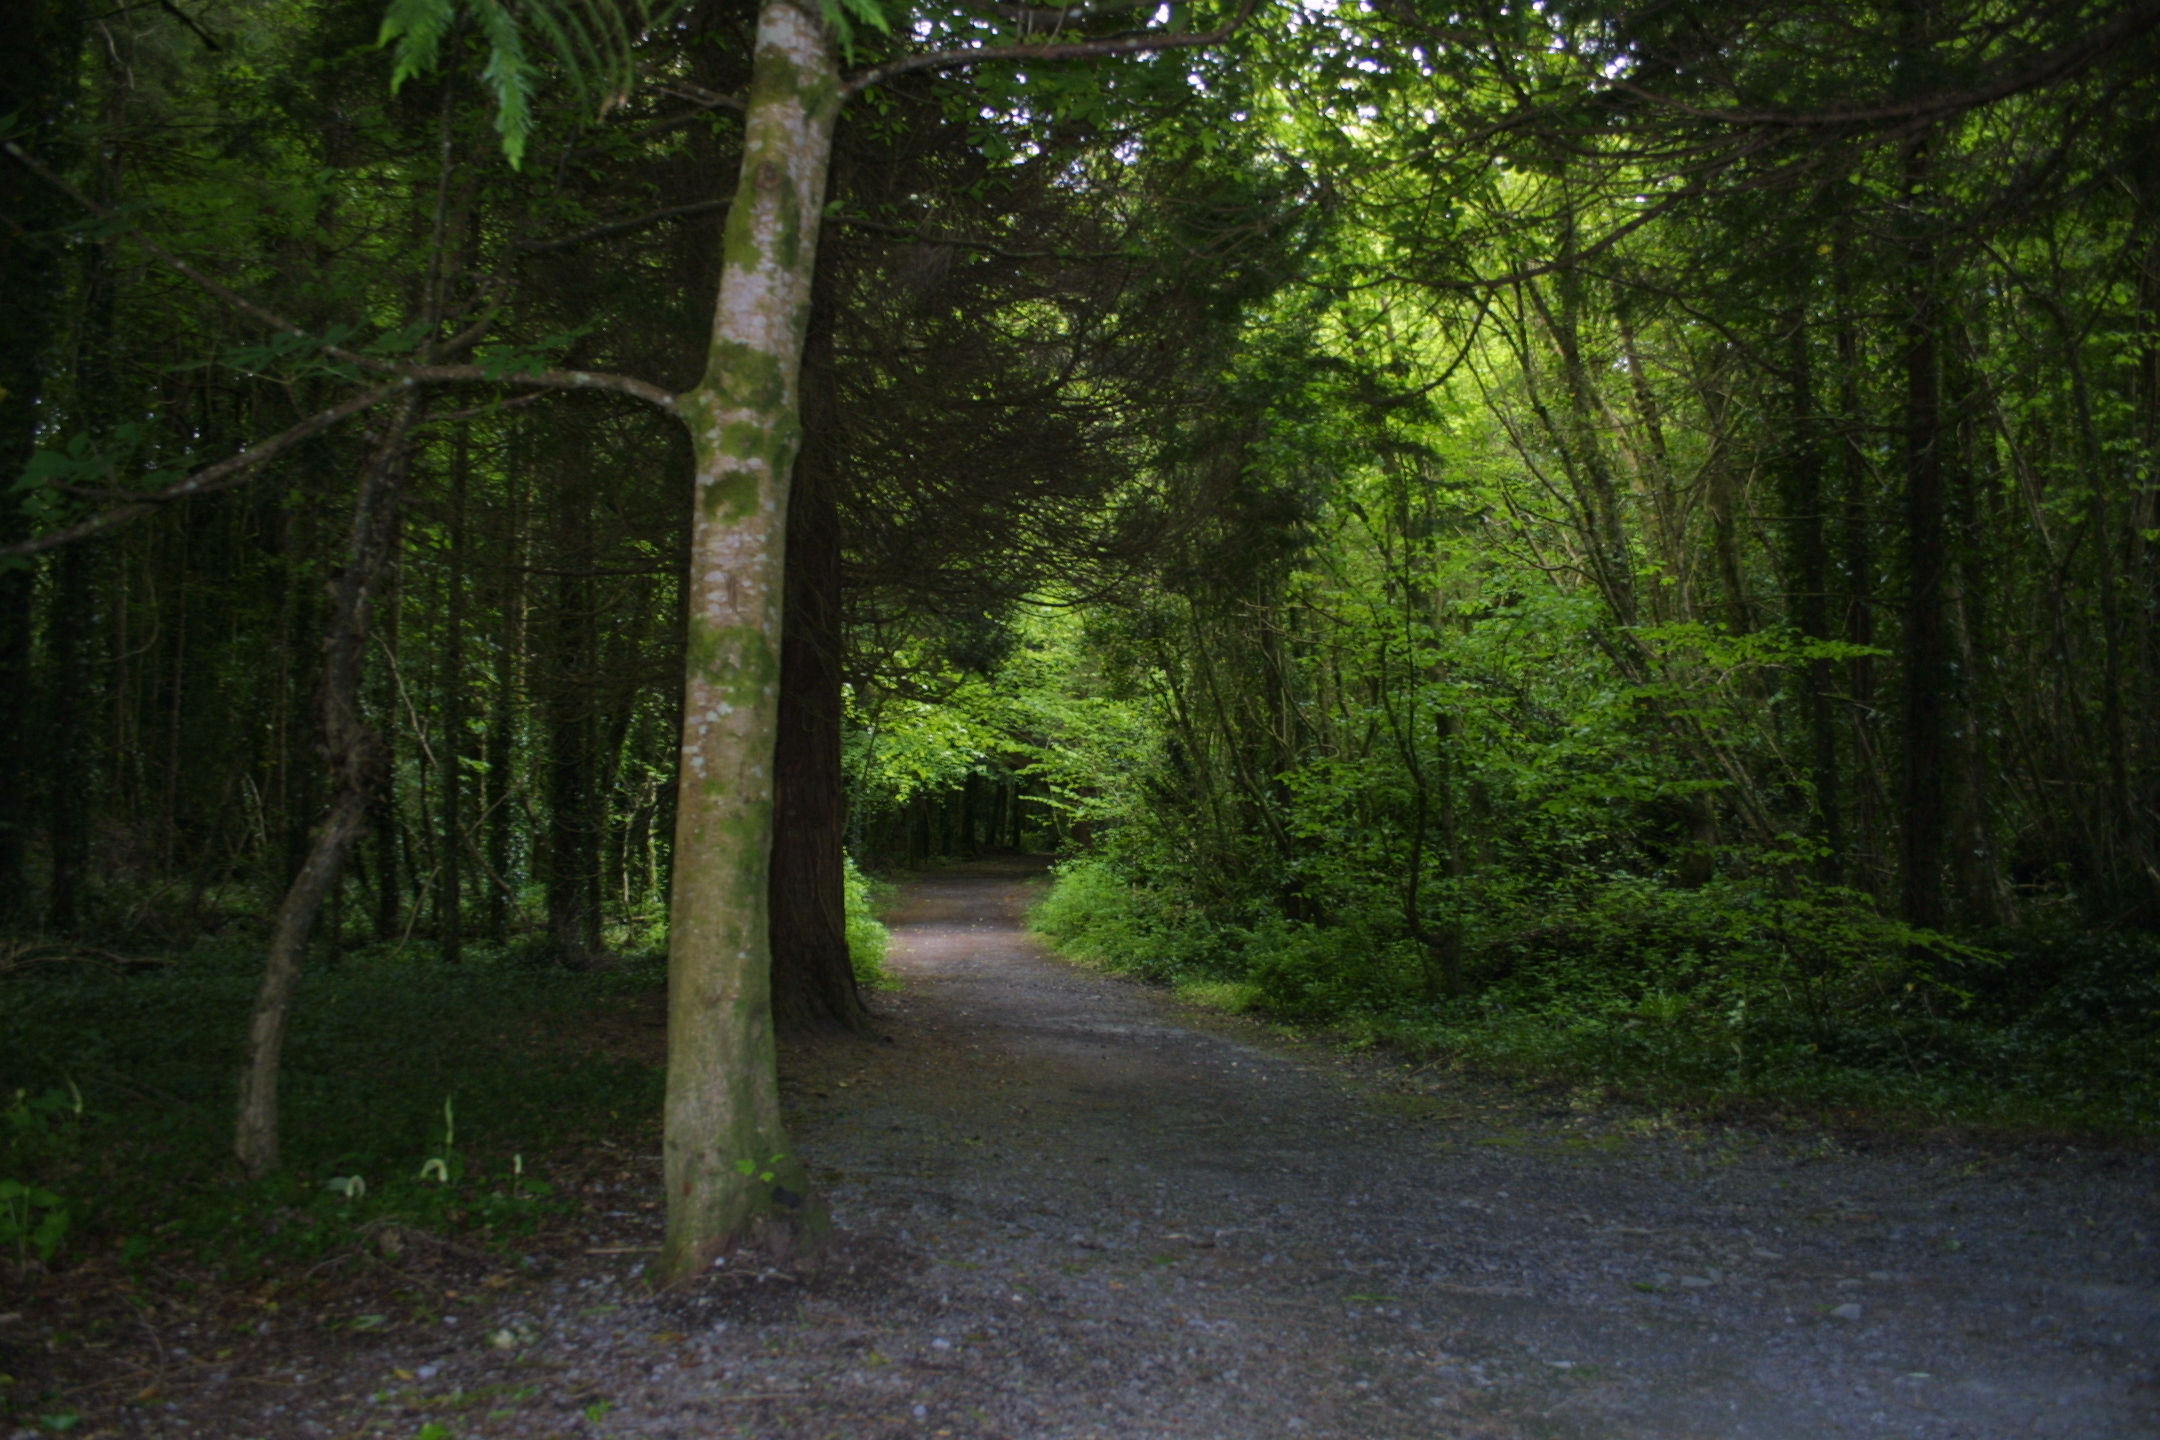 woods trail | Understanding Weakness